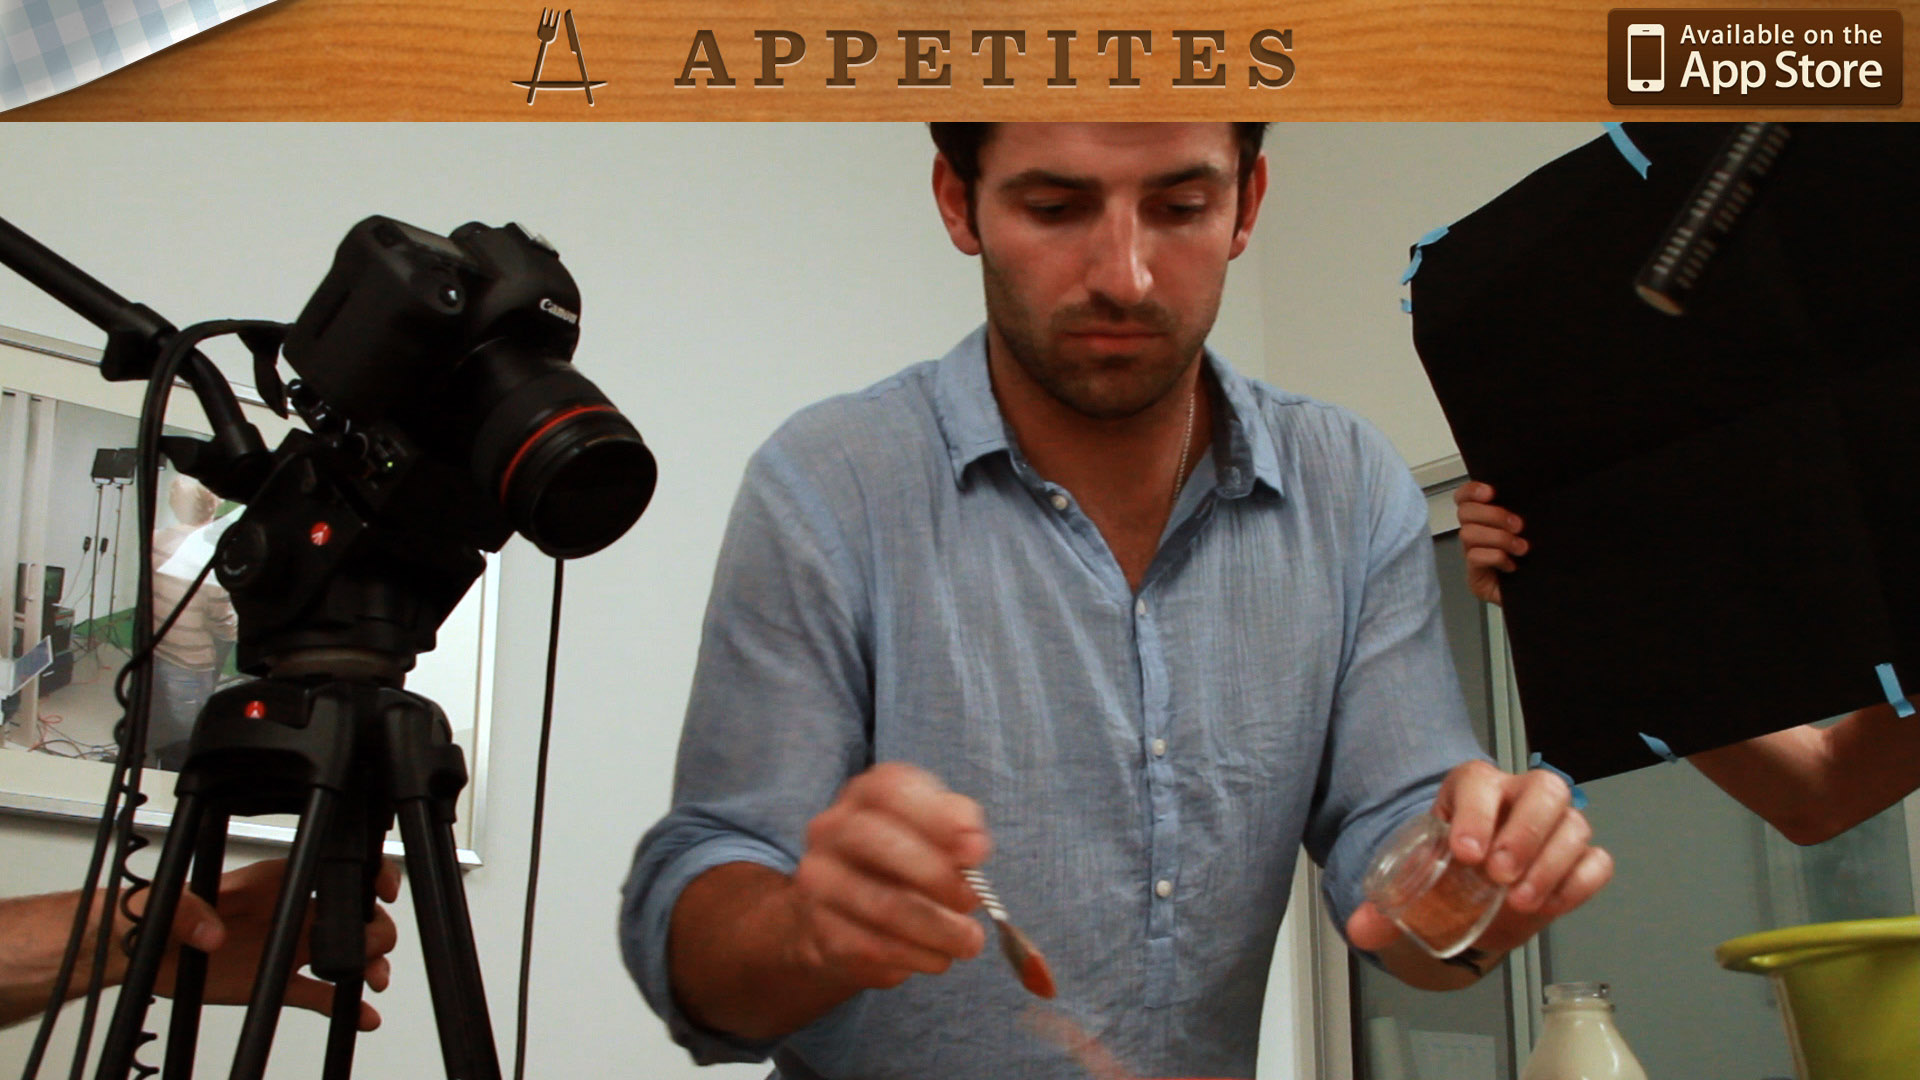 Appetites® as seen on Virgin America